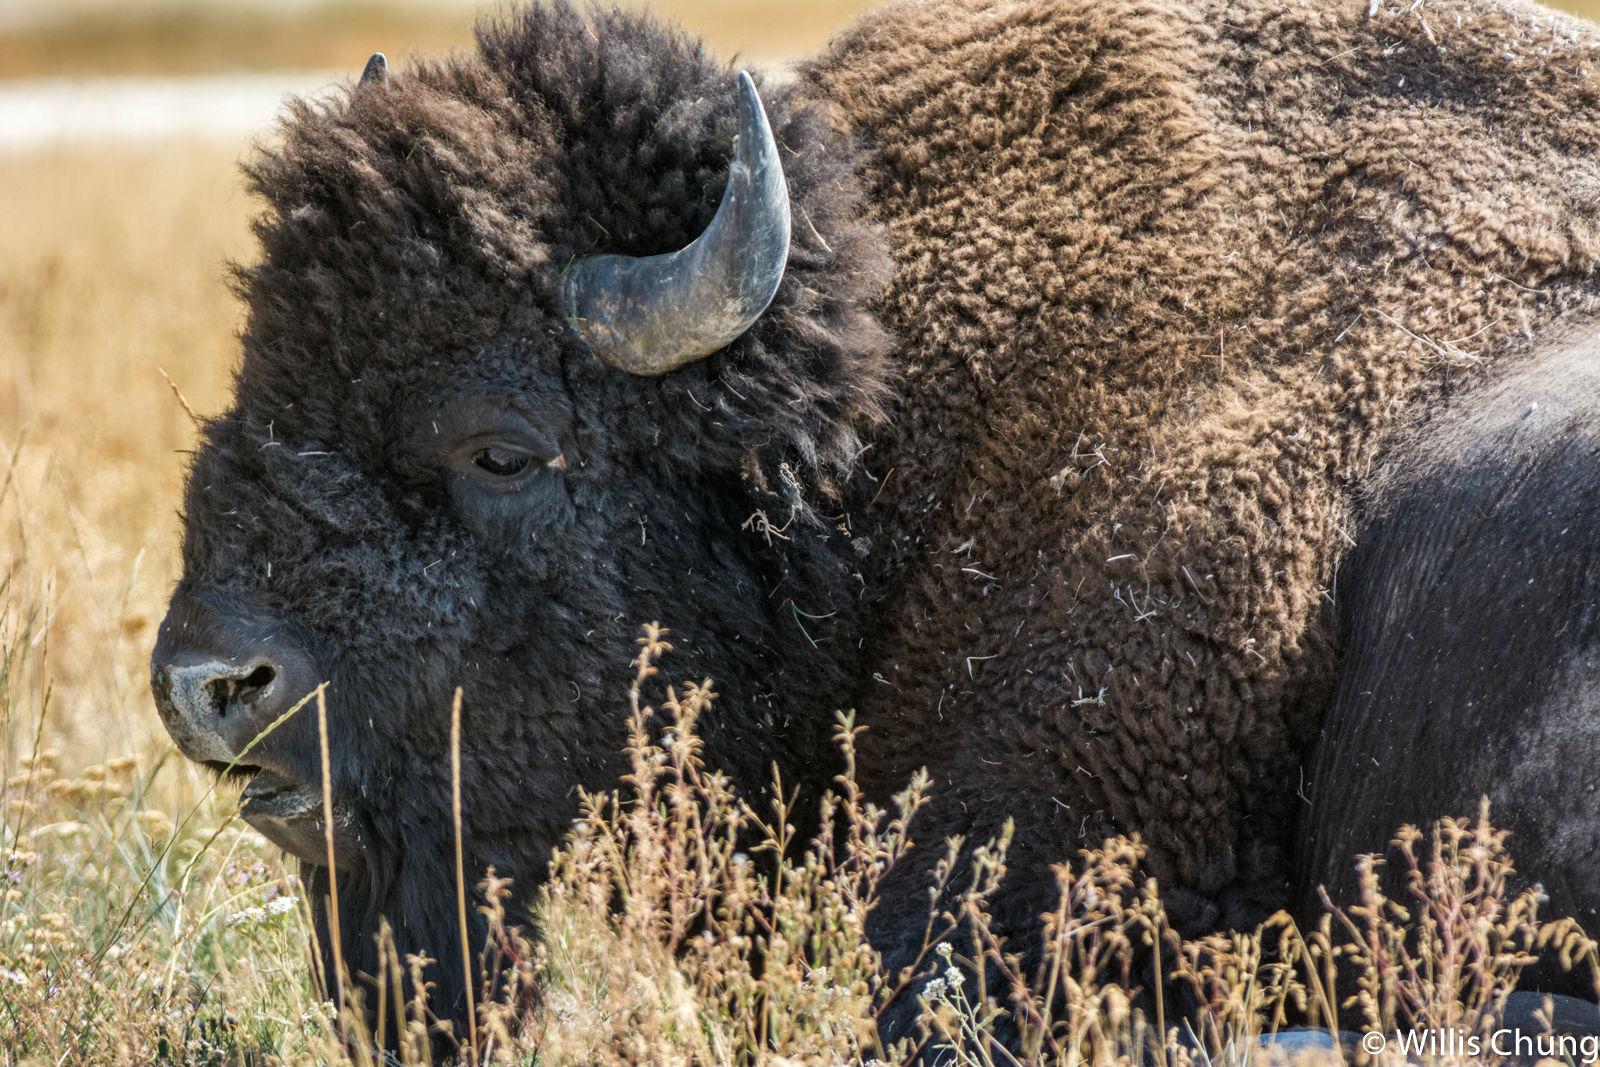 Chung Yellowstone Bull 2 image